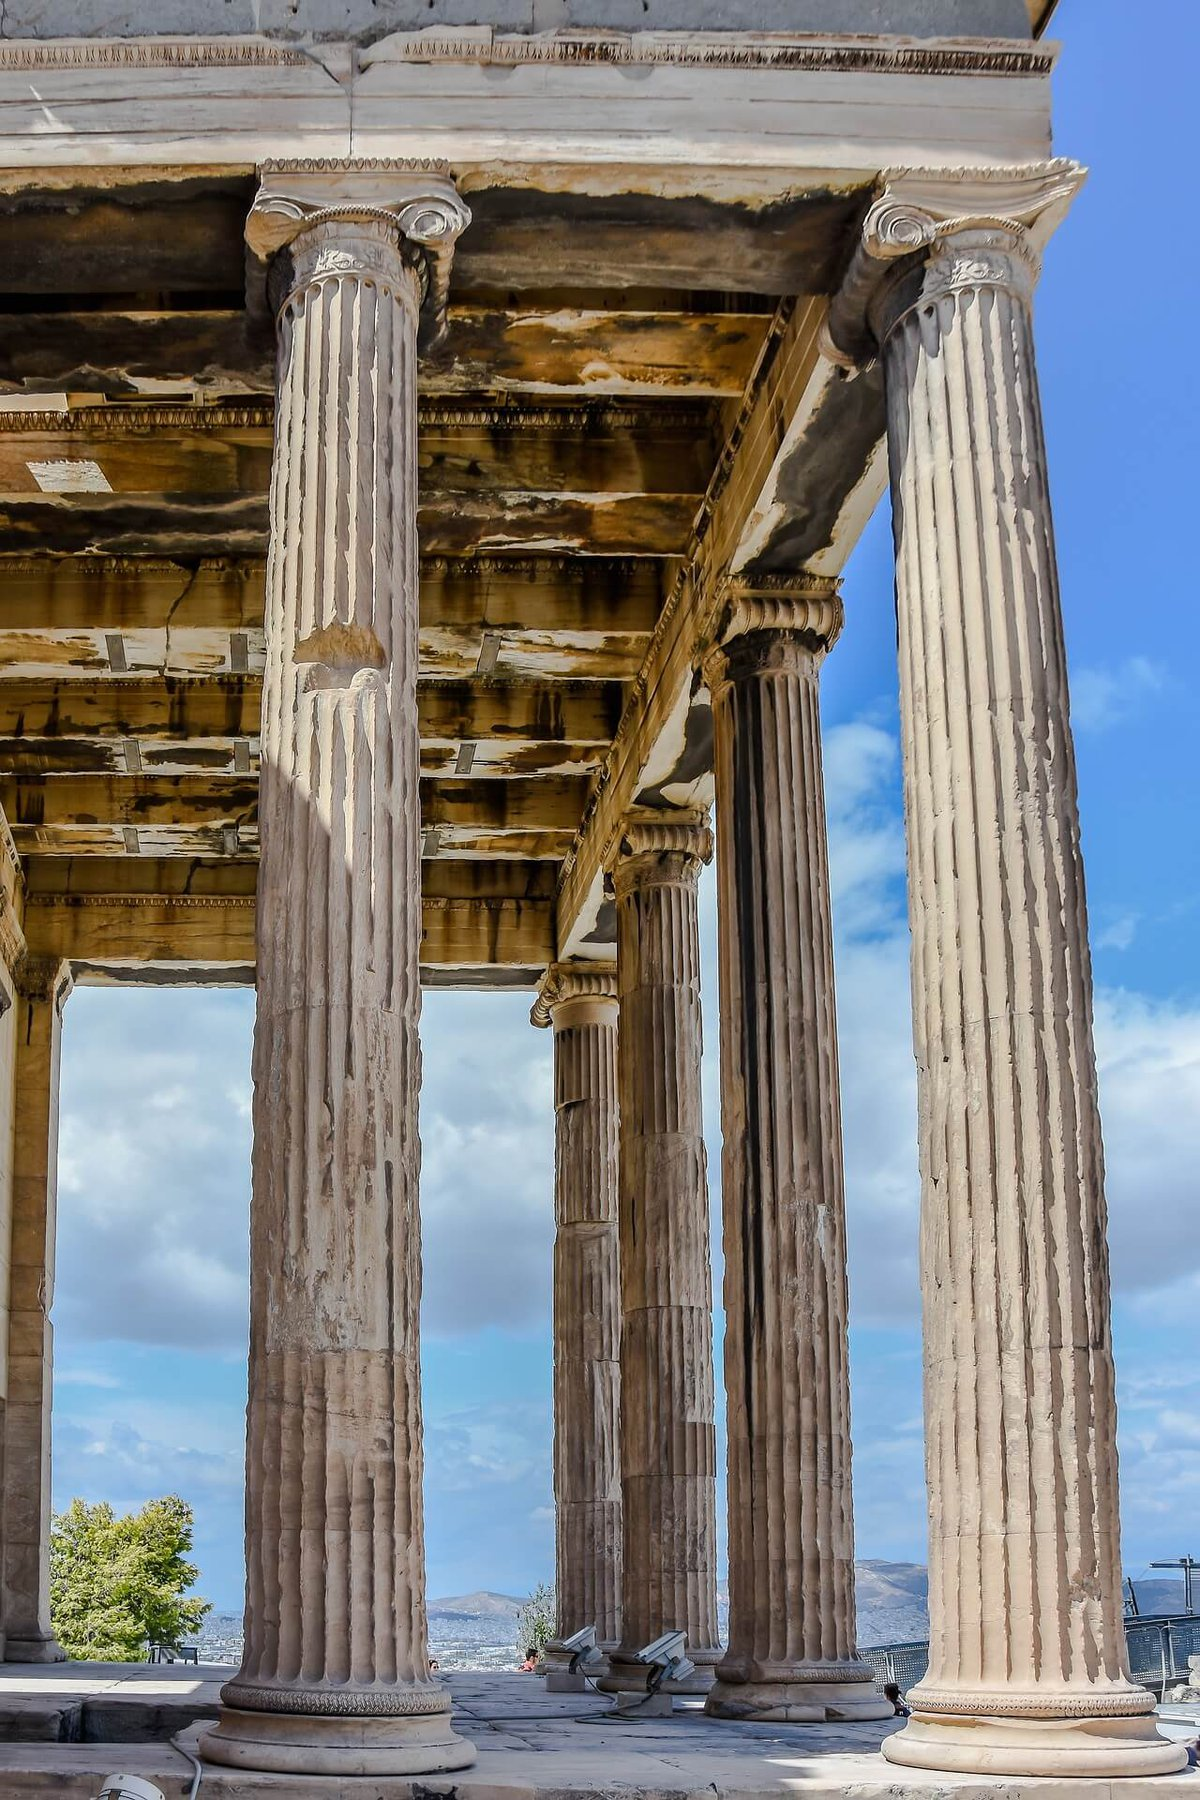 athens-acropolis-2725920_1920-pixabay.jpg